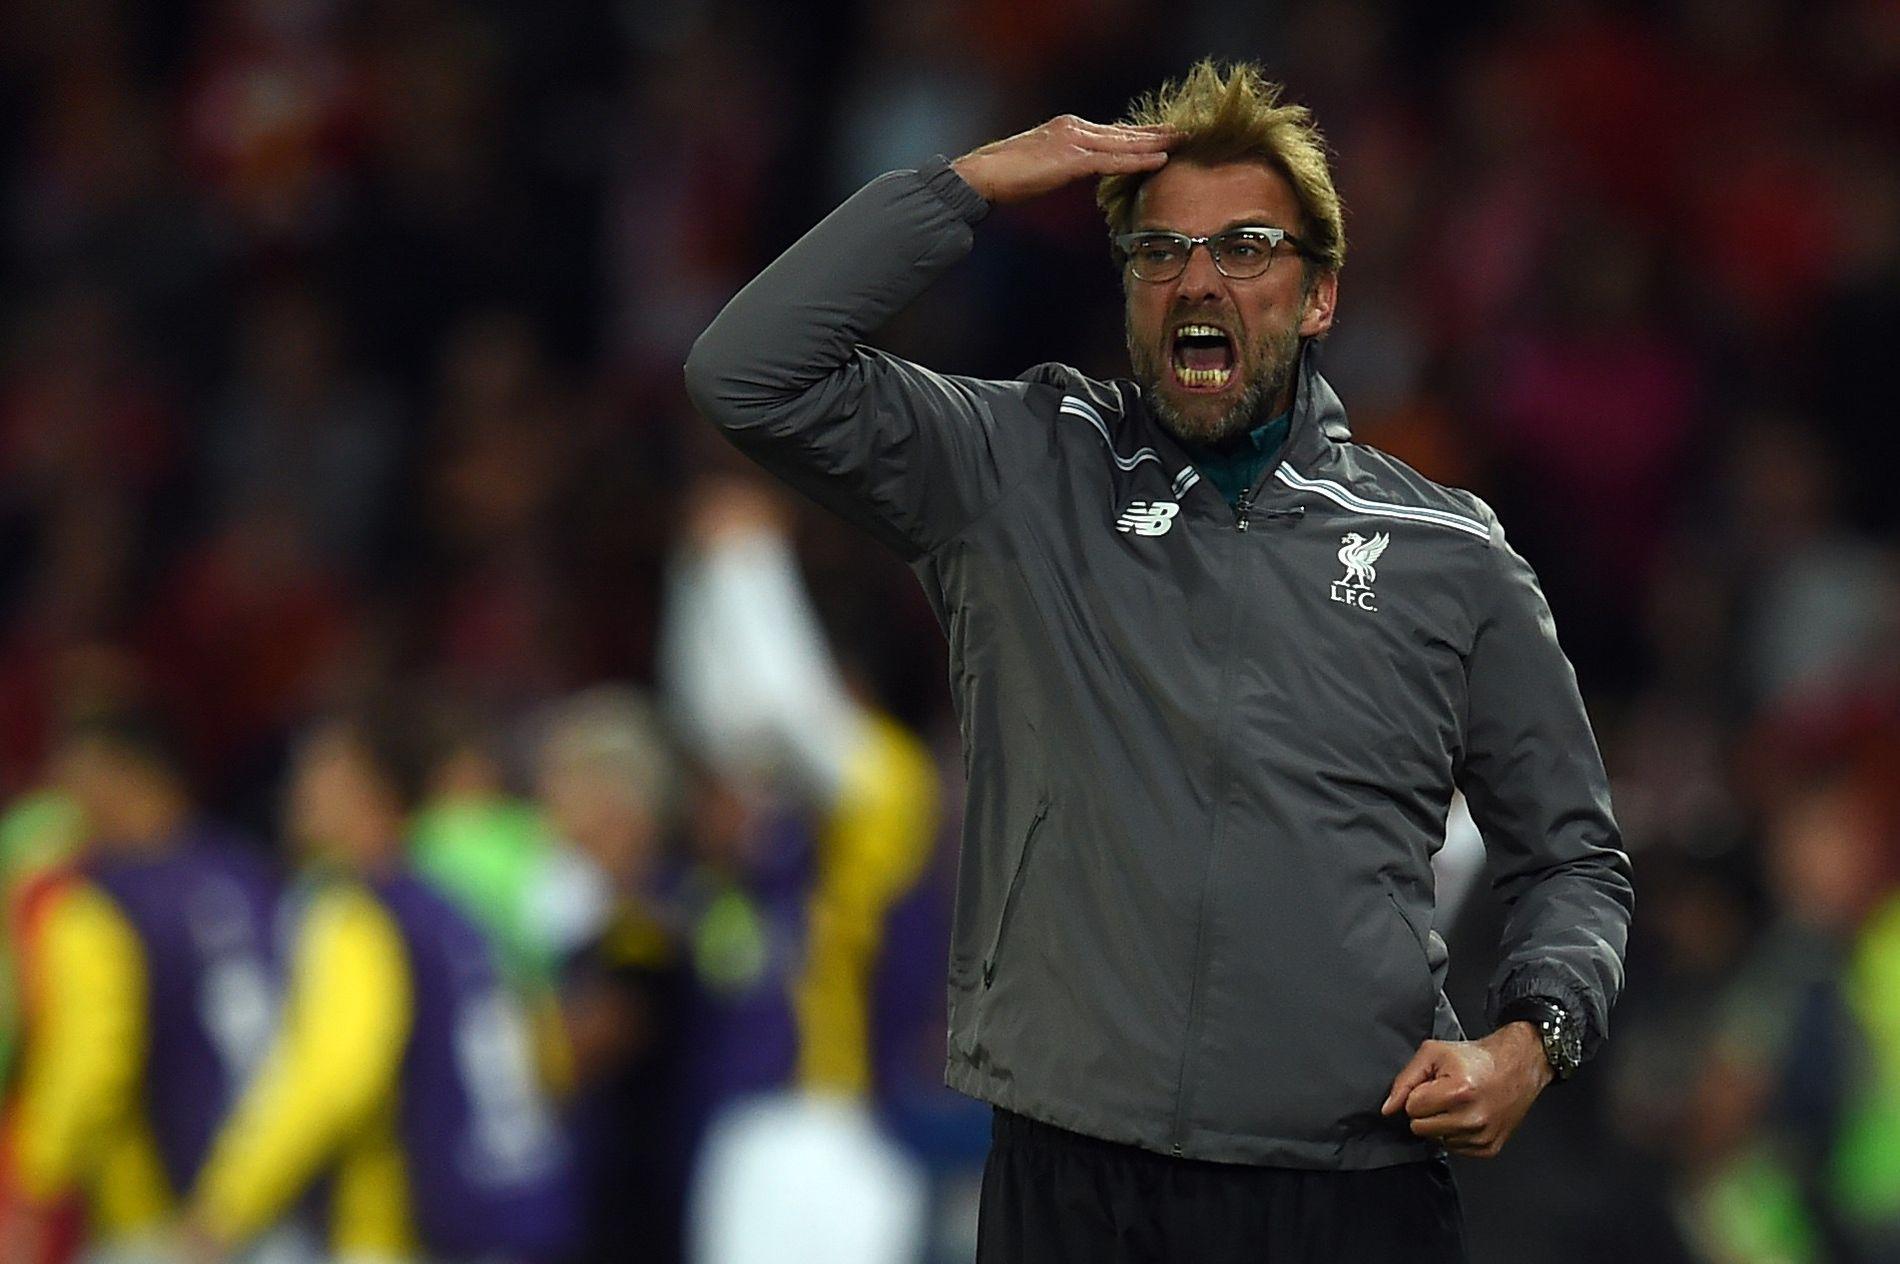 TYSK TEMPERAMENT: Jürgen Klupp var heller ublid da hans Liverpool tapte 3–1 for Sevilla i St. Jakob-Park i Basel i 2016.